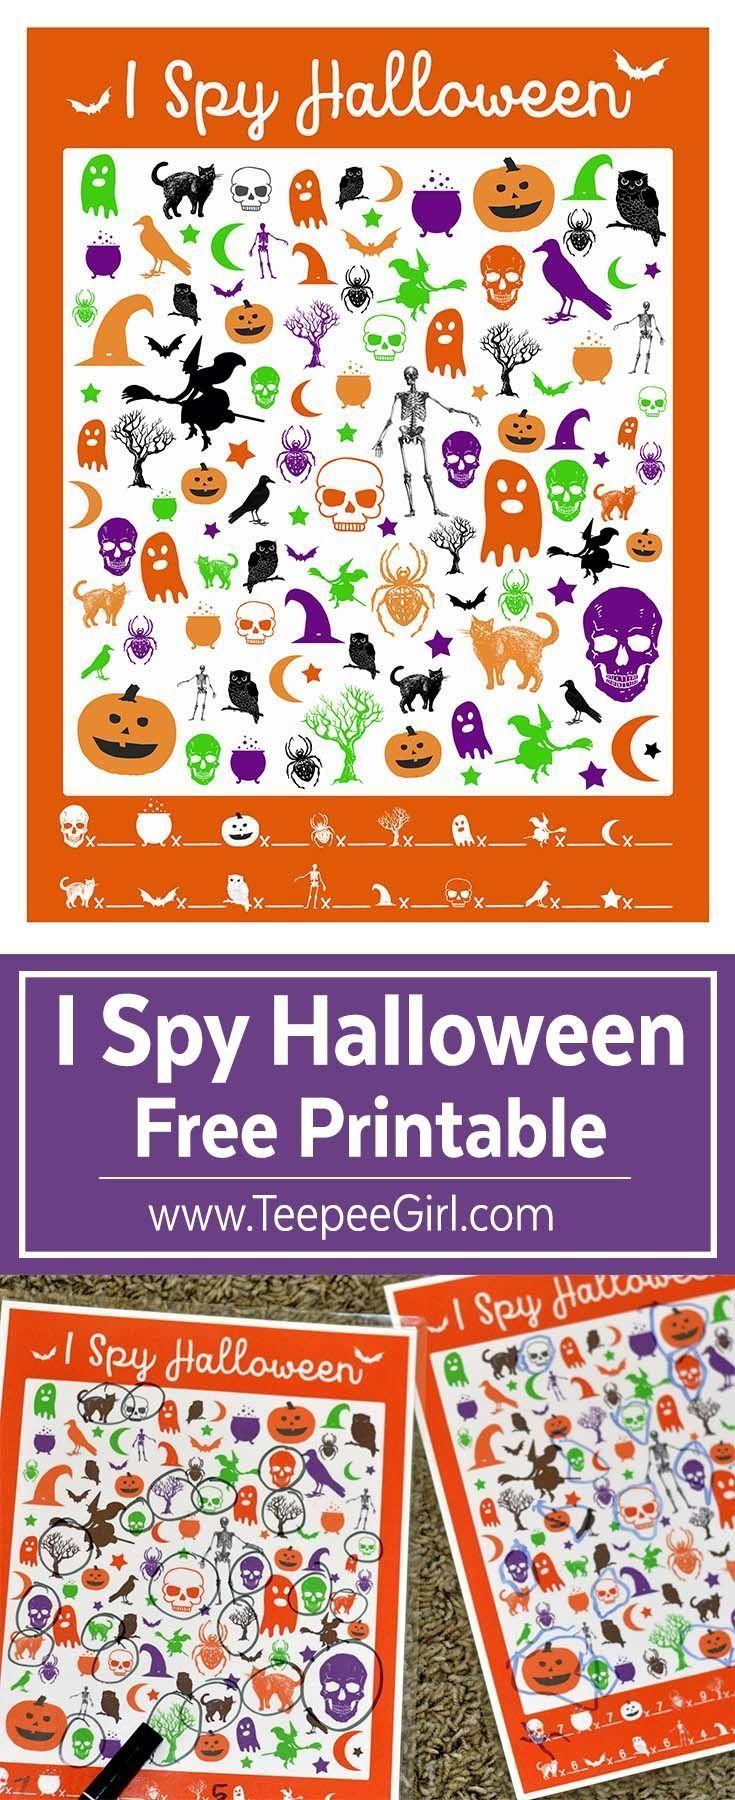 Free I Spy Halloween Game Halloween games, Halloween